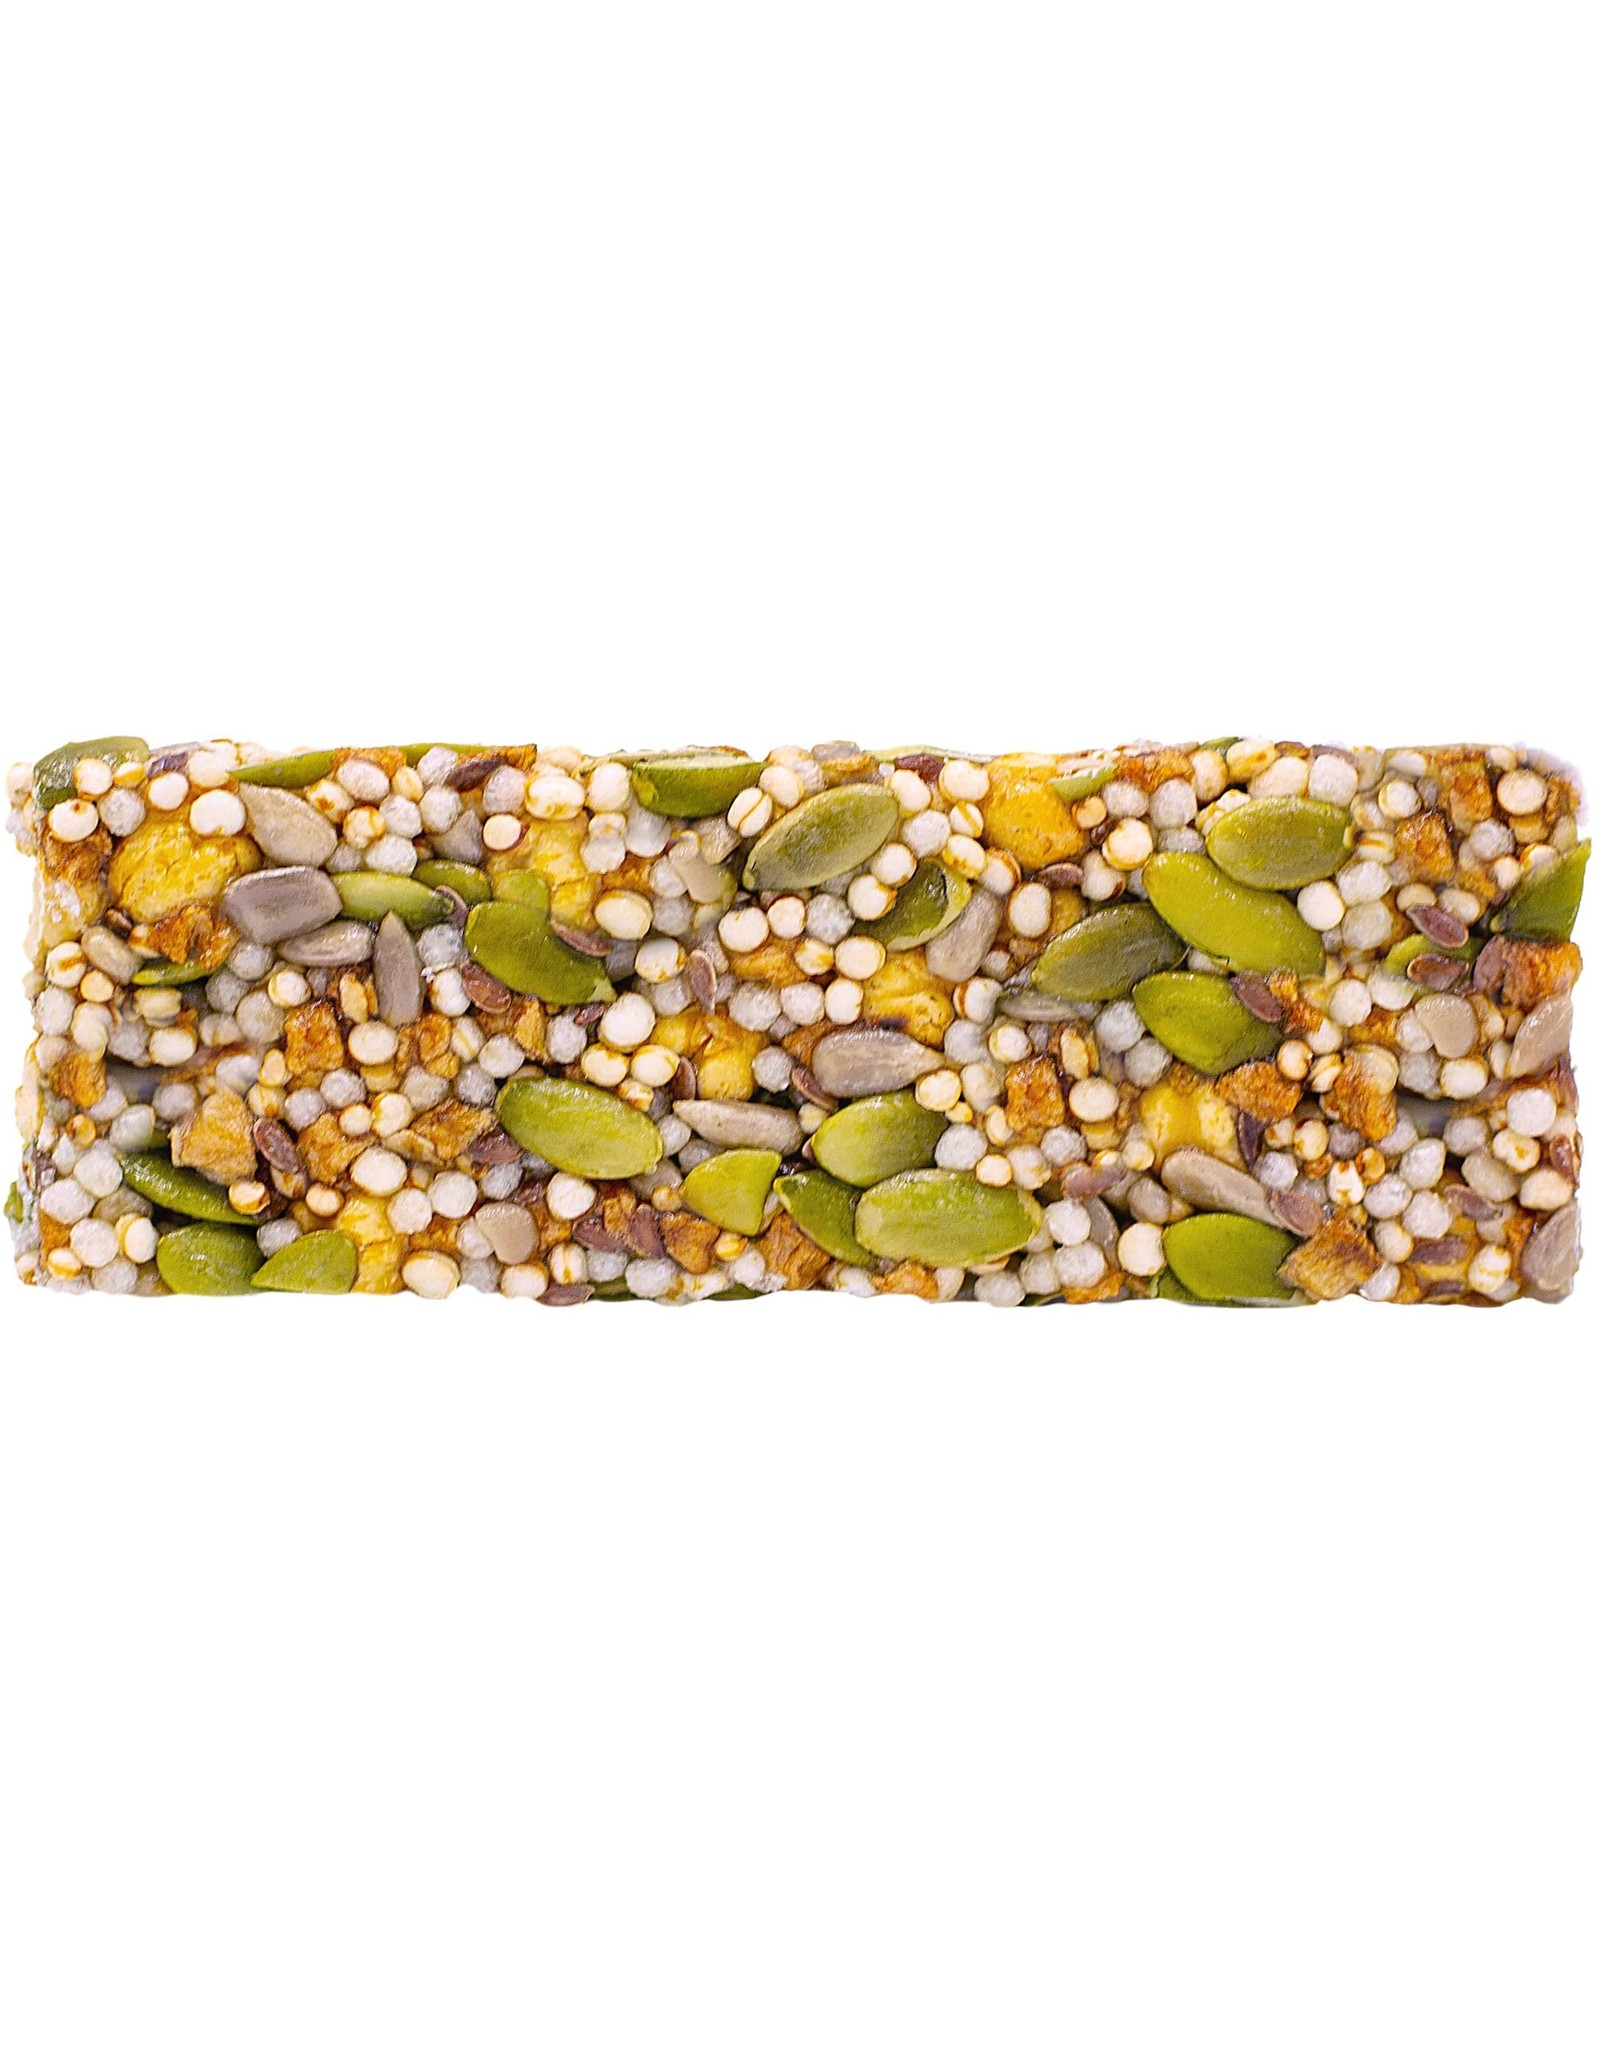 Blake's Seed Based Seeds And Fruit Pineapple Snack Bar